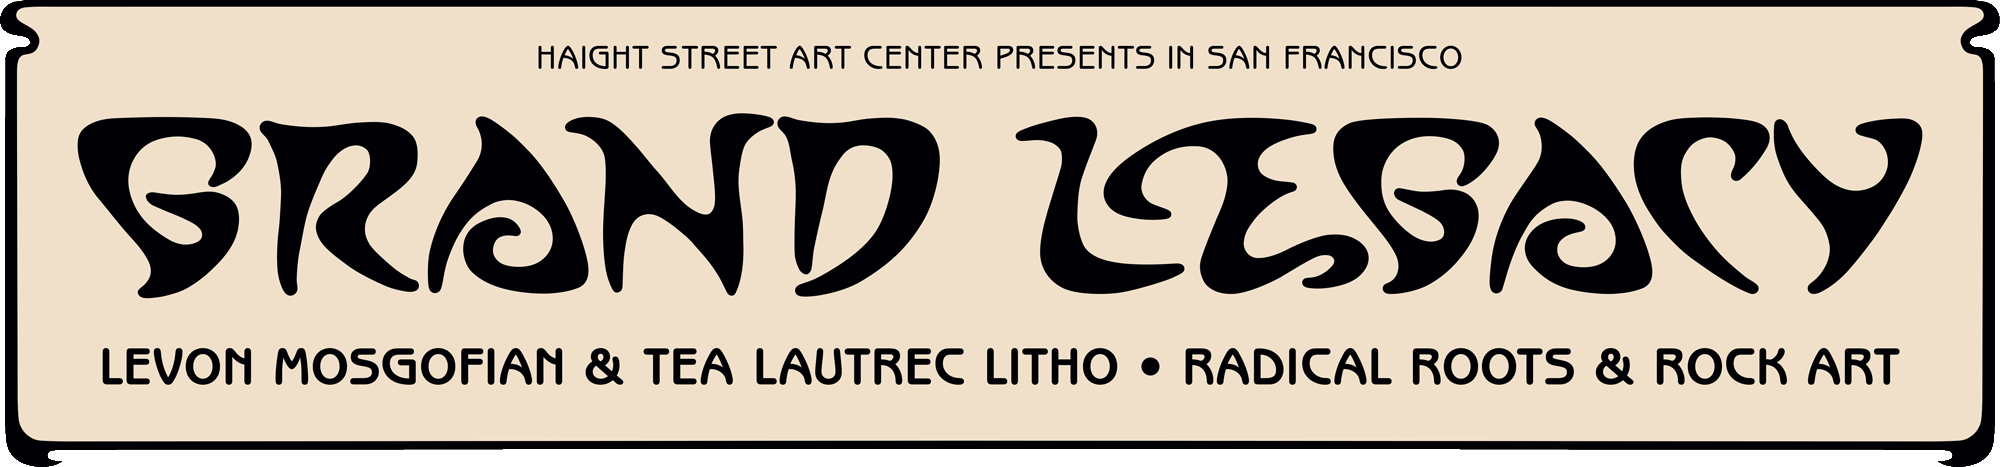 Haight Street Art Center presents in San Francisco: Grand Legacy - Levon Mosgofian & Tea Lautrec Litho • Radical Roots & Rock Art